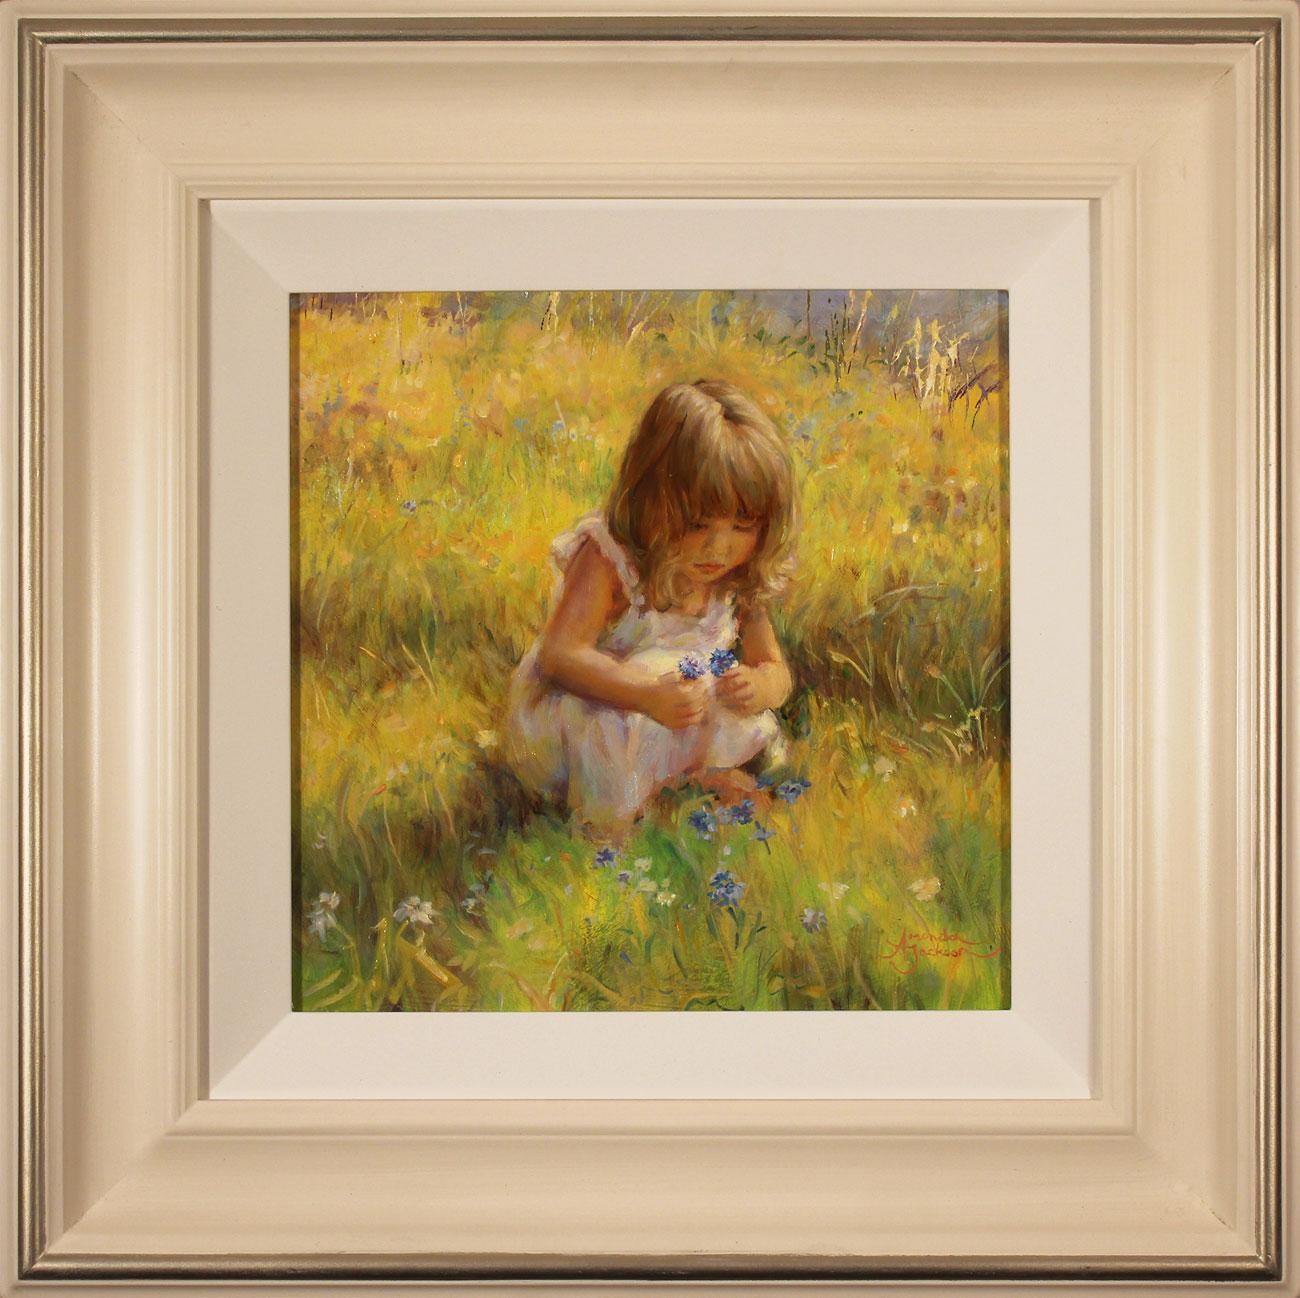 Amanda Jackson, Original oil painting on panel, Cornflowers. Click to enlarge